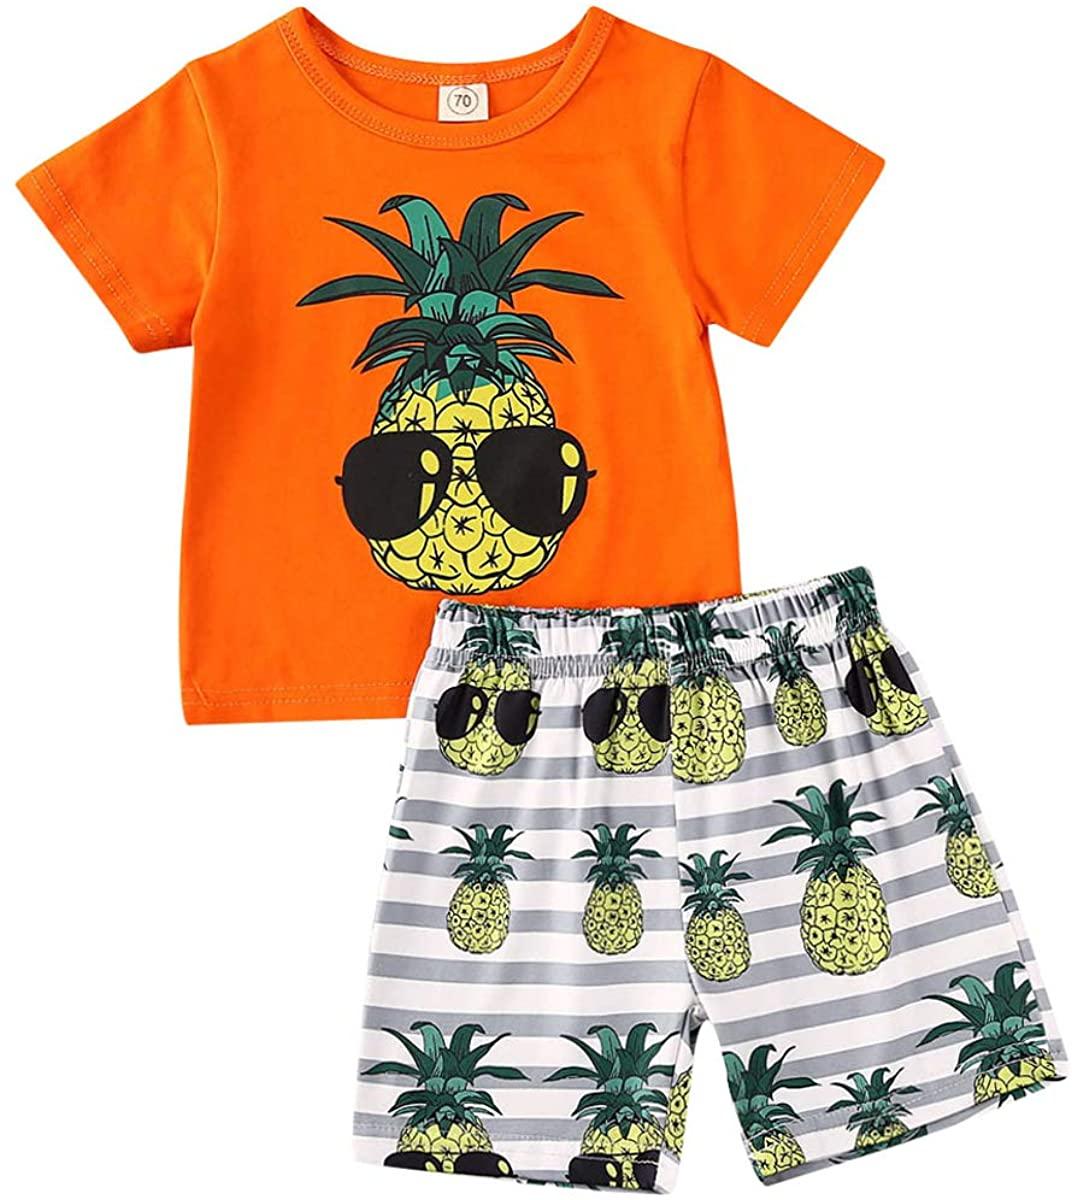 2Pcs Toddler Baby Boys Summer Clothing Sets Cute Animal Print Sleeveless Tank Tops T-Shirt+Palm Shorts Outfits